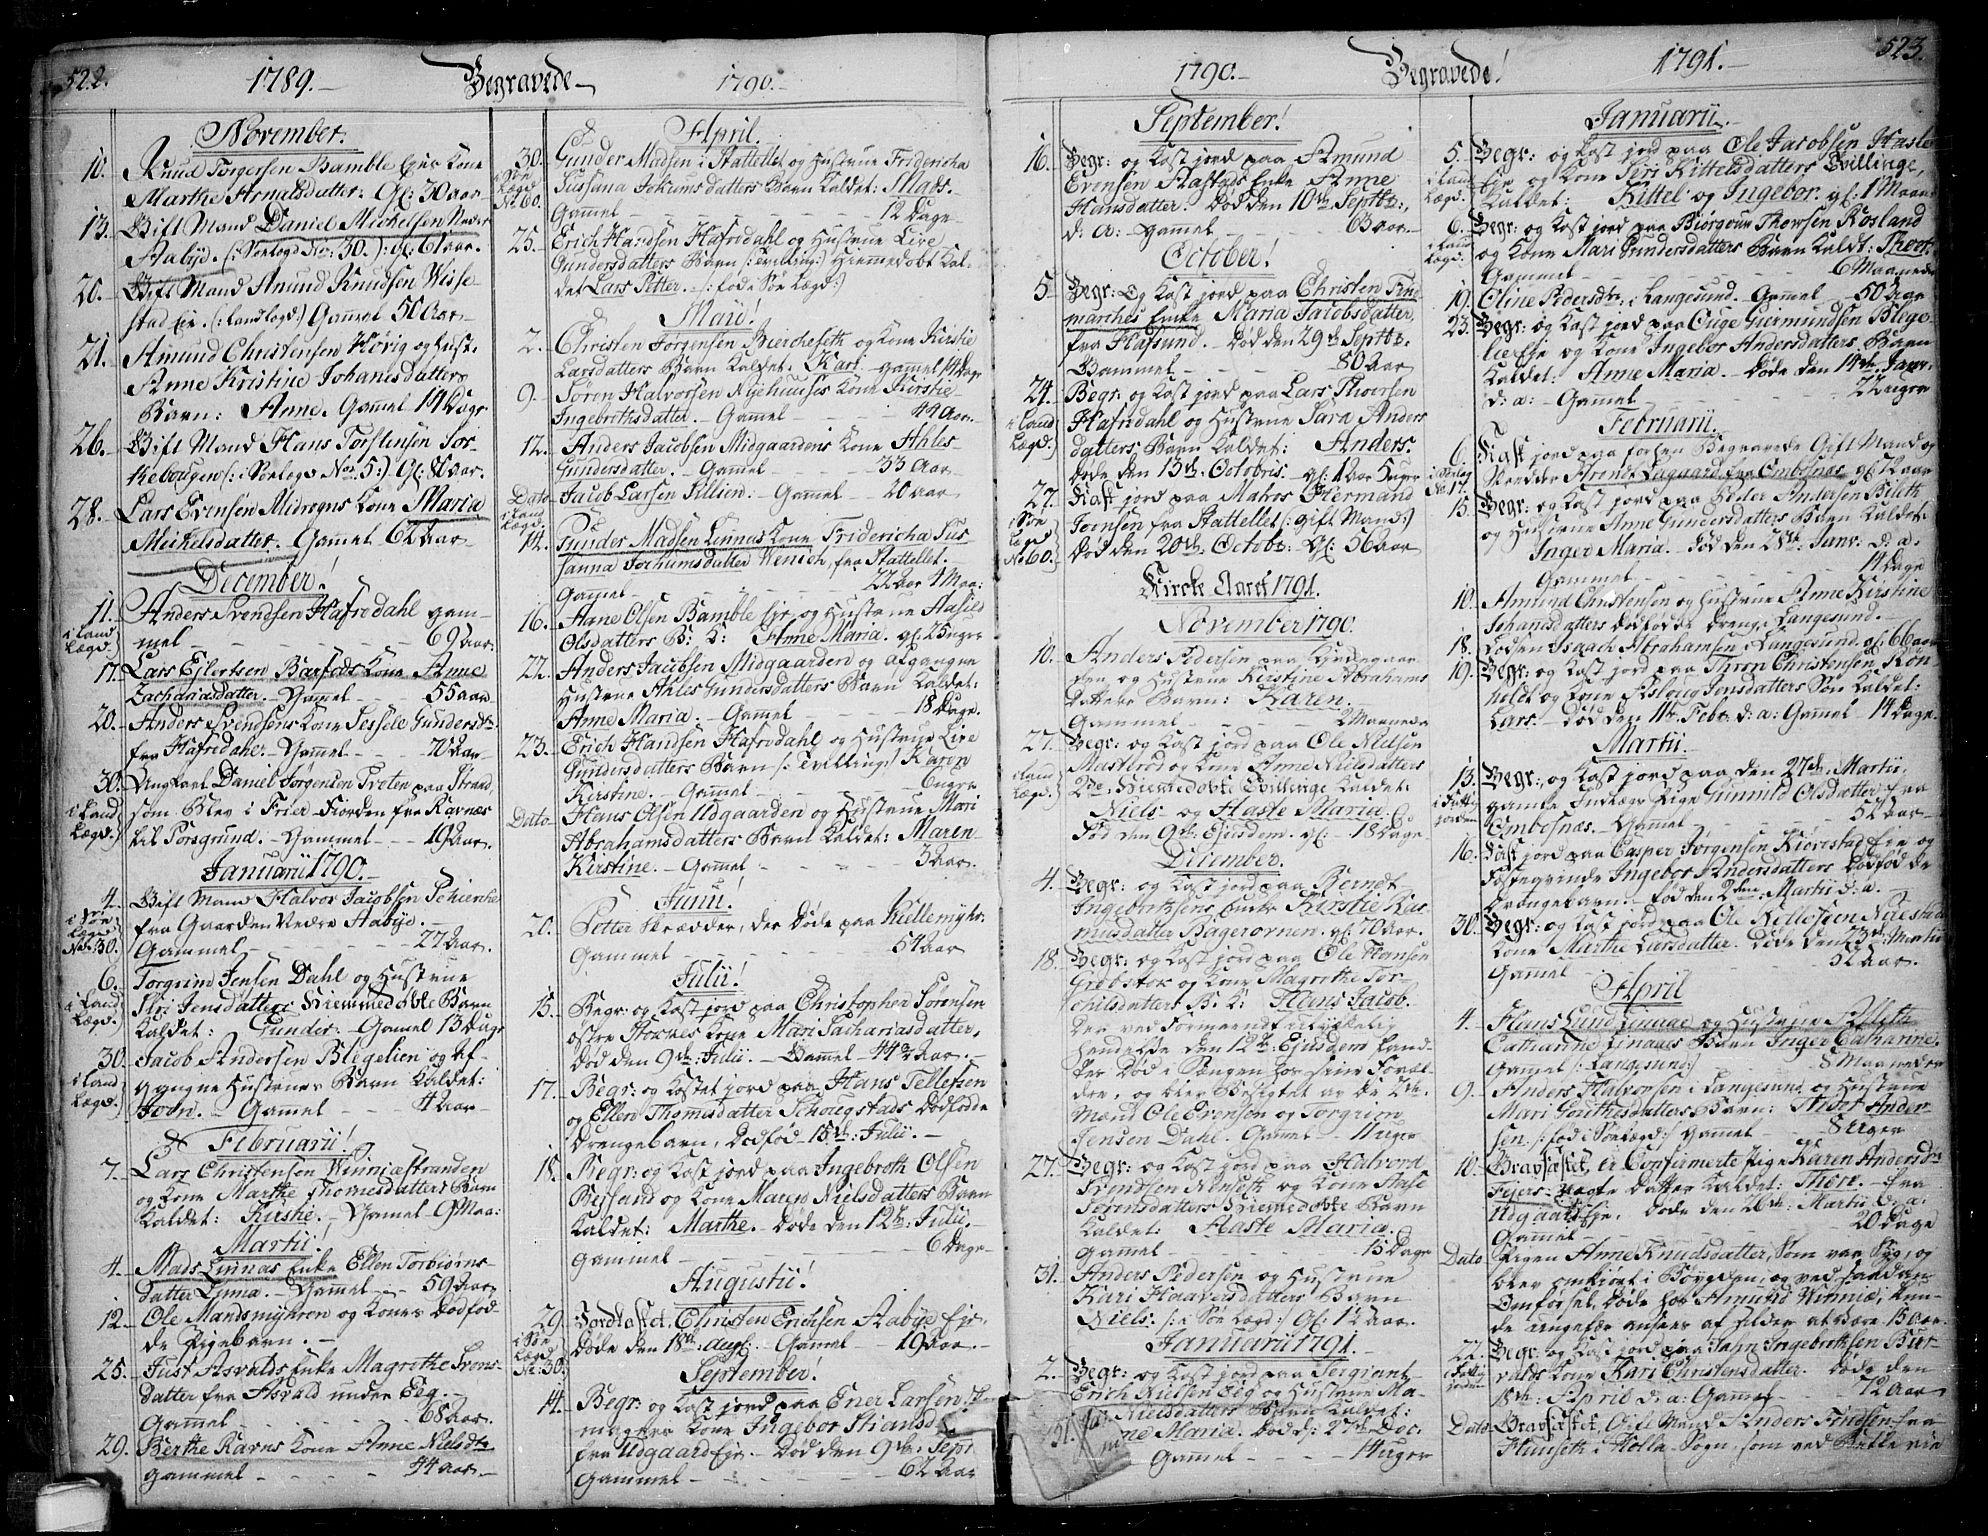 SAKO, Bamble kirkebøker, F/Fa/L0002: Ministerialbok nr. I 2, 1775-1814, s. 522-523